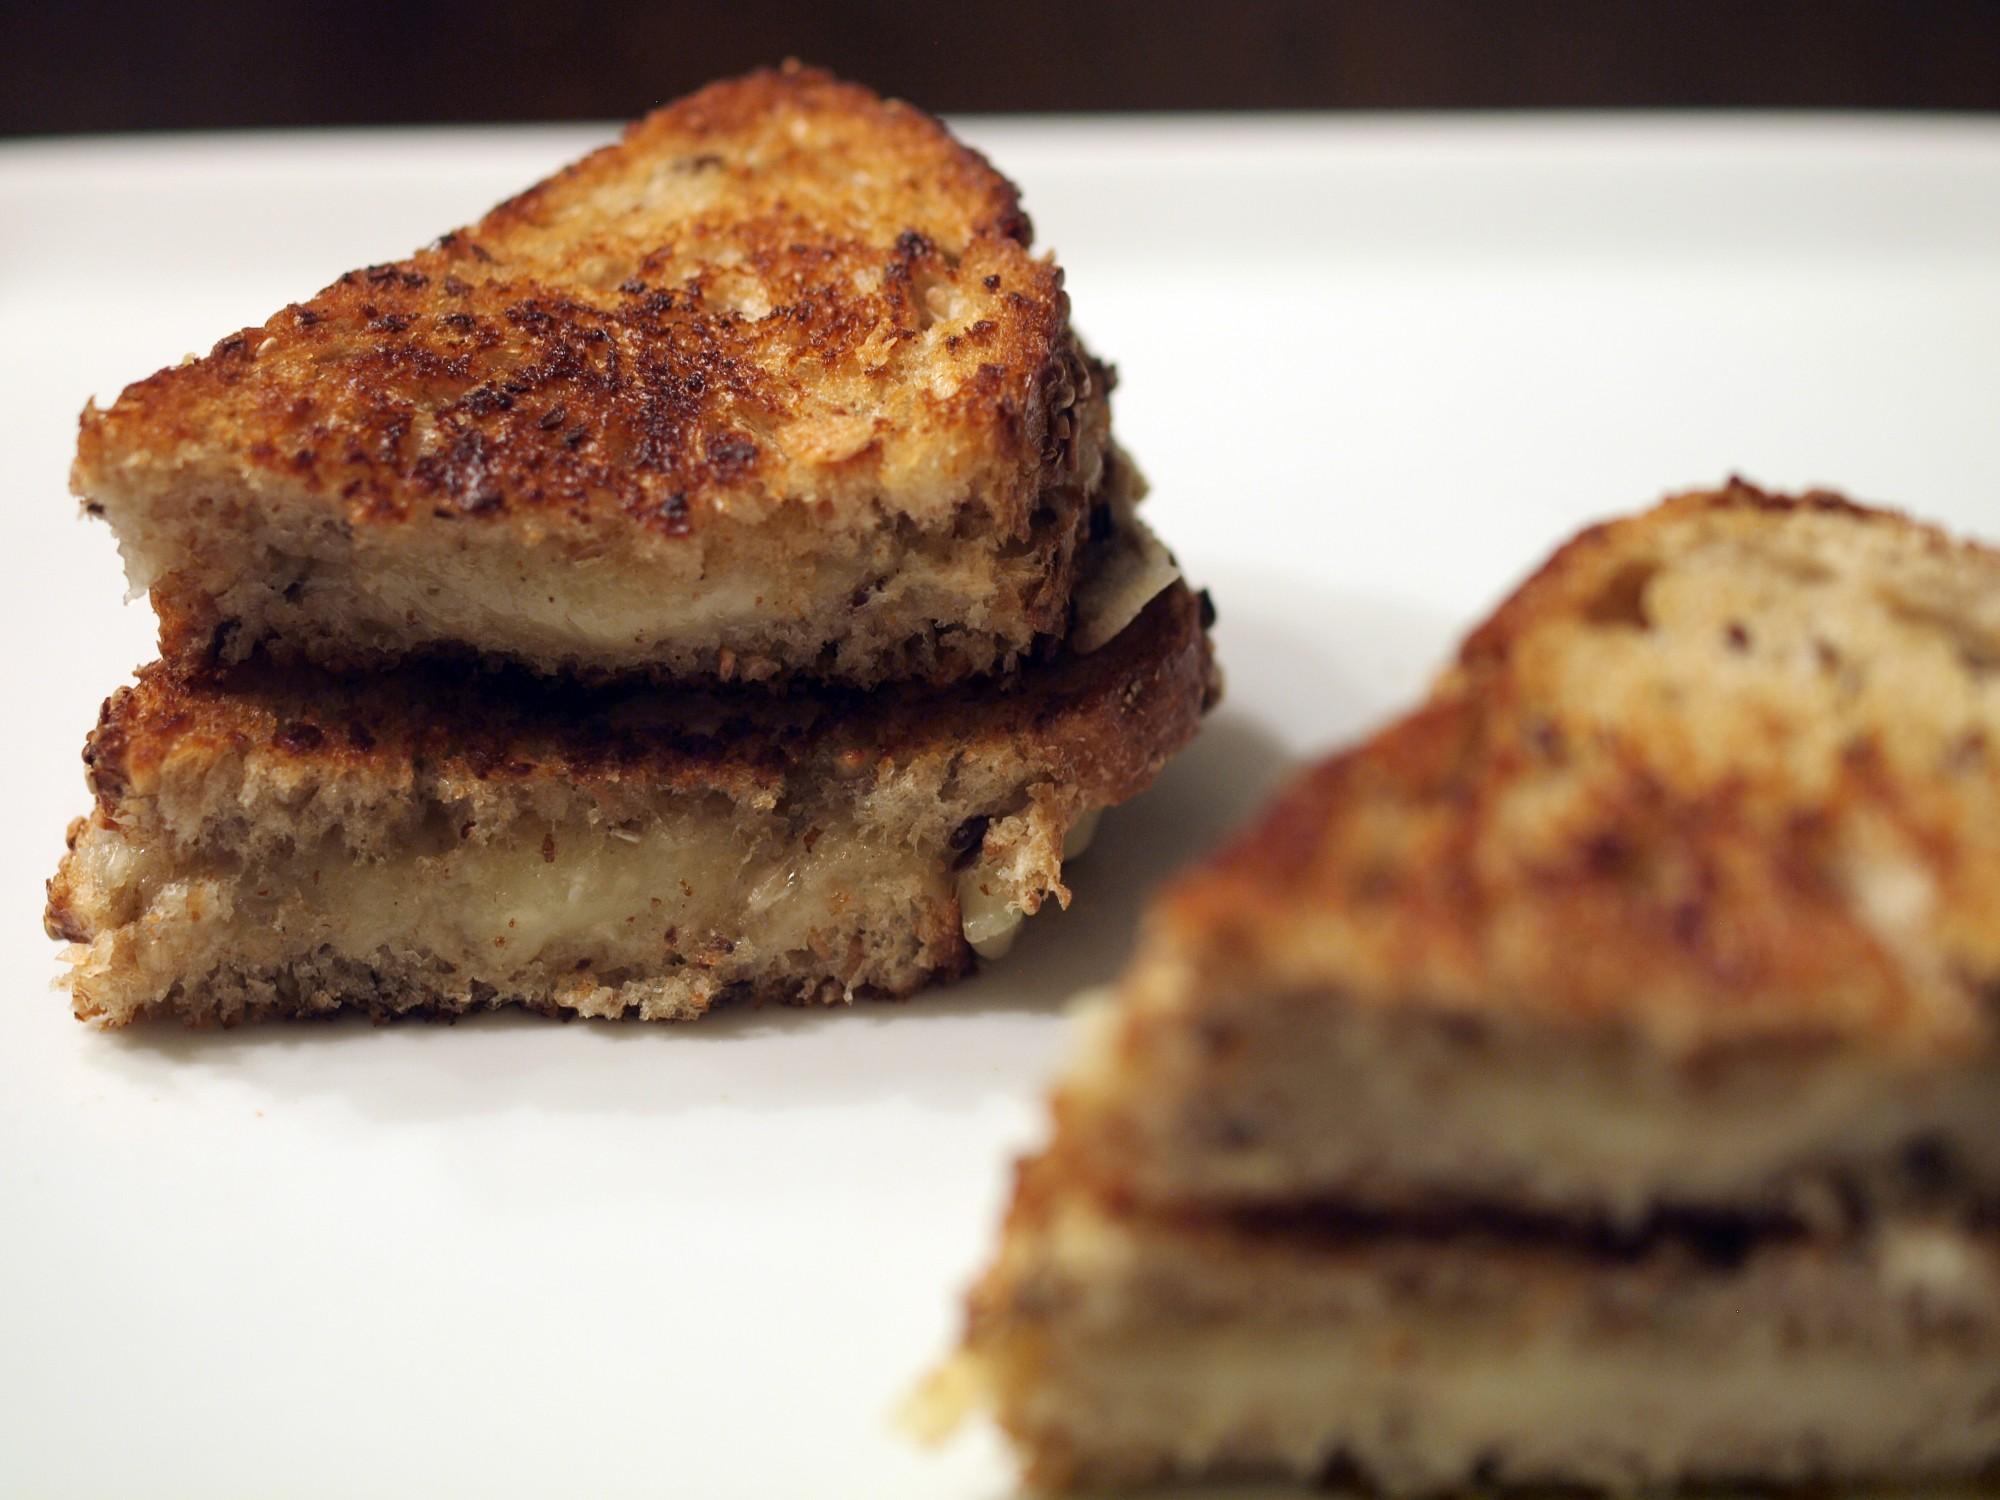 Lou Bergier Pichin & Rustico Red Pepper Cheeses